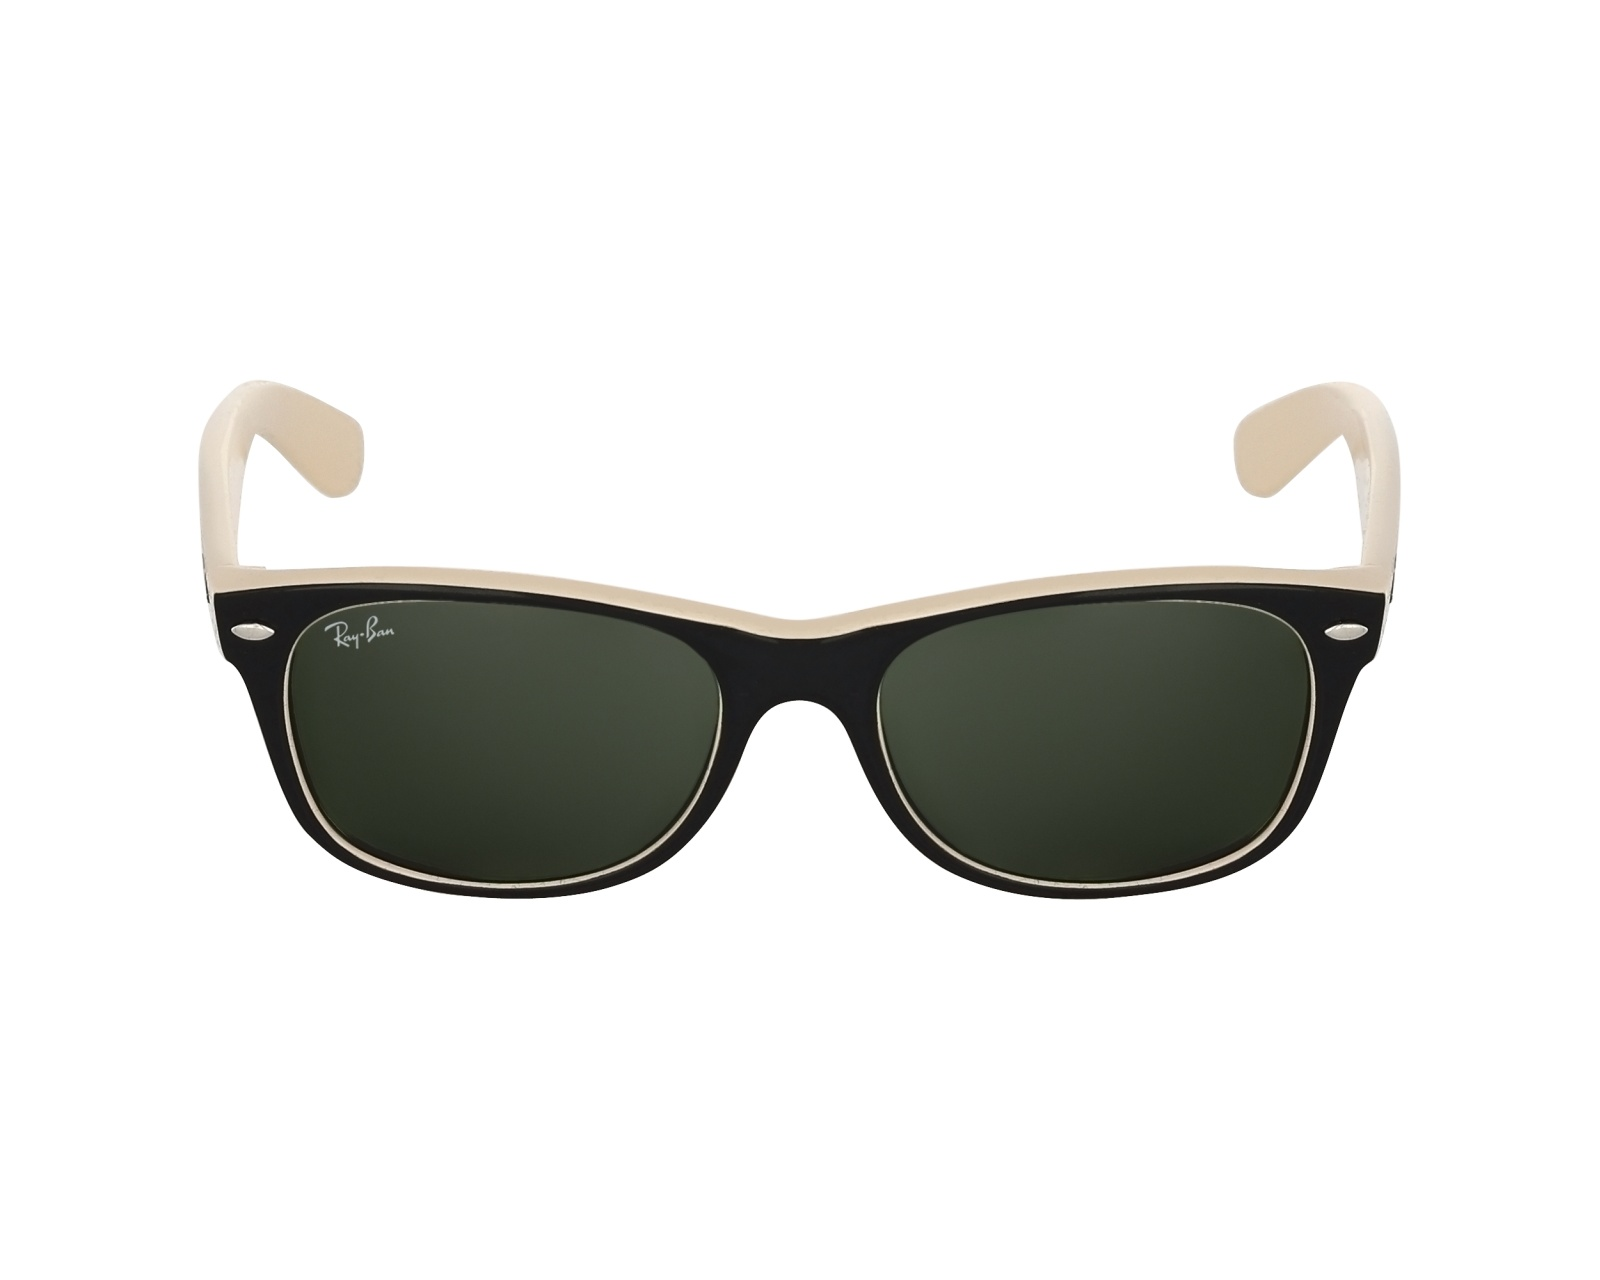 Sunglasses Ray-Ban RB-2132 875 - Black Beige profile view f50dc362889